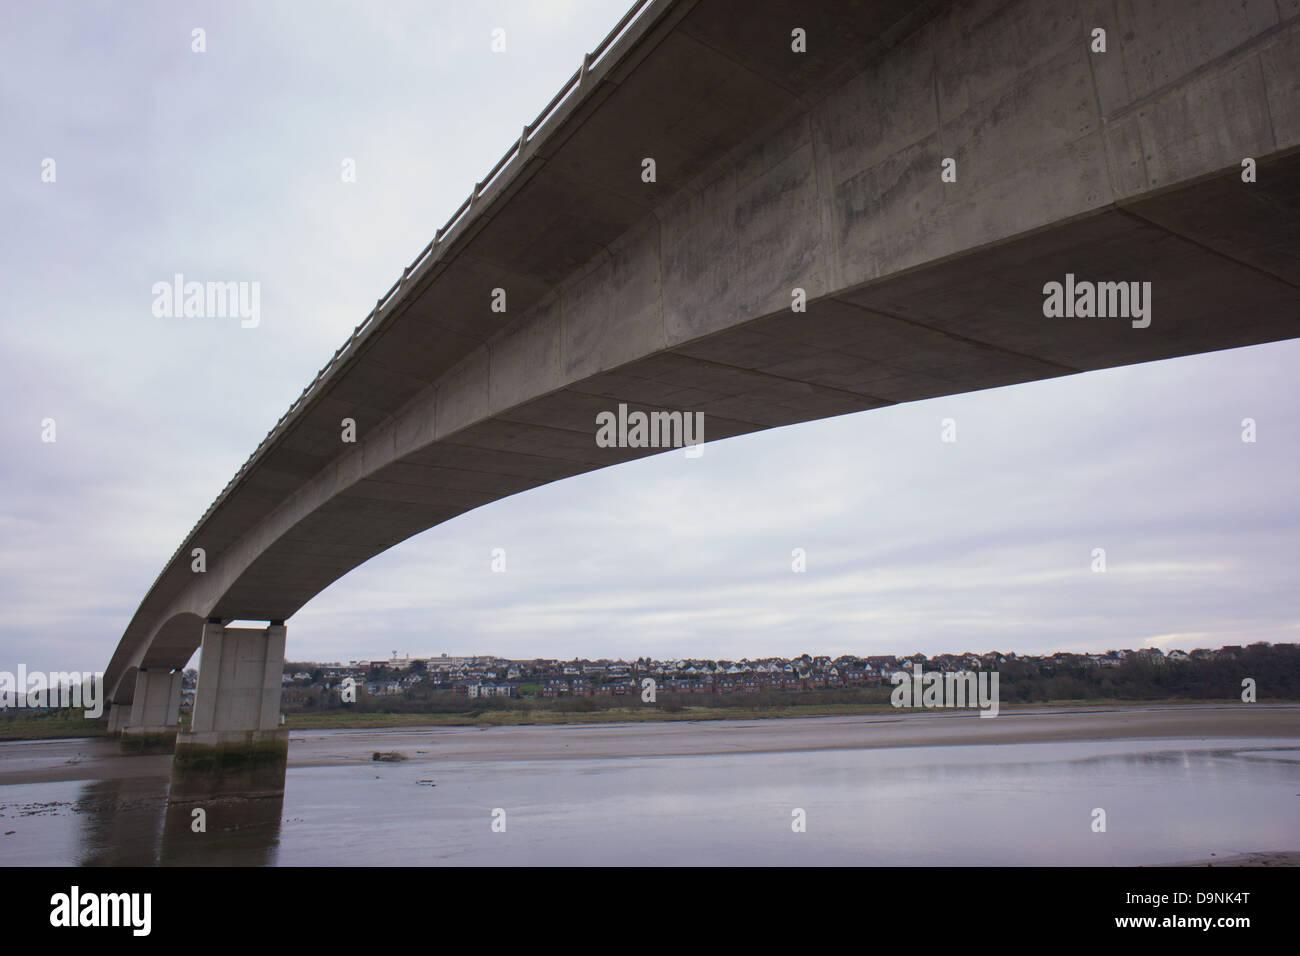 The Taw Bridge spanning the river Taw, Barntsaple, Devon - Stock Image